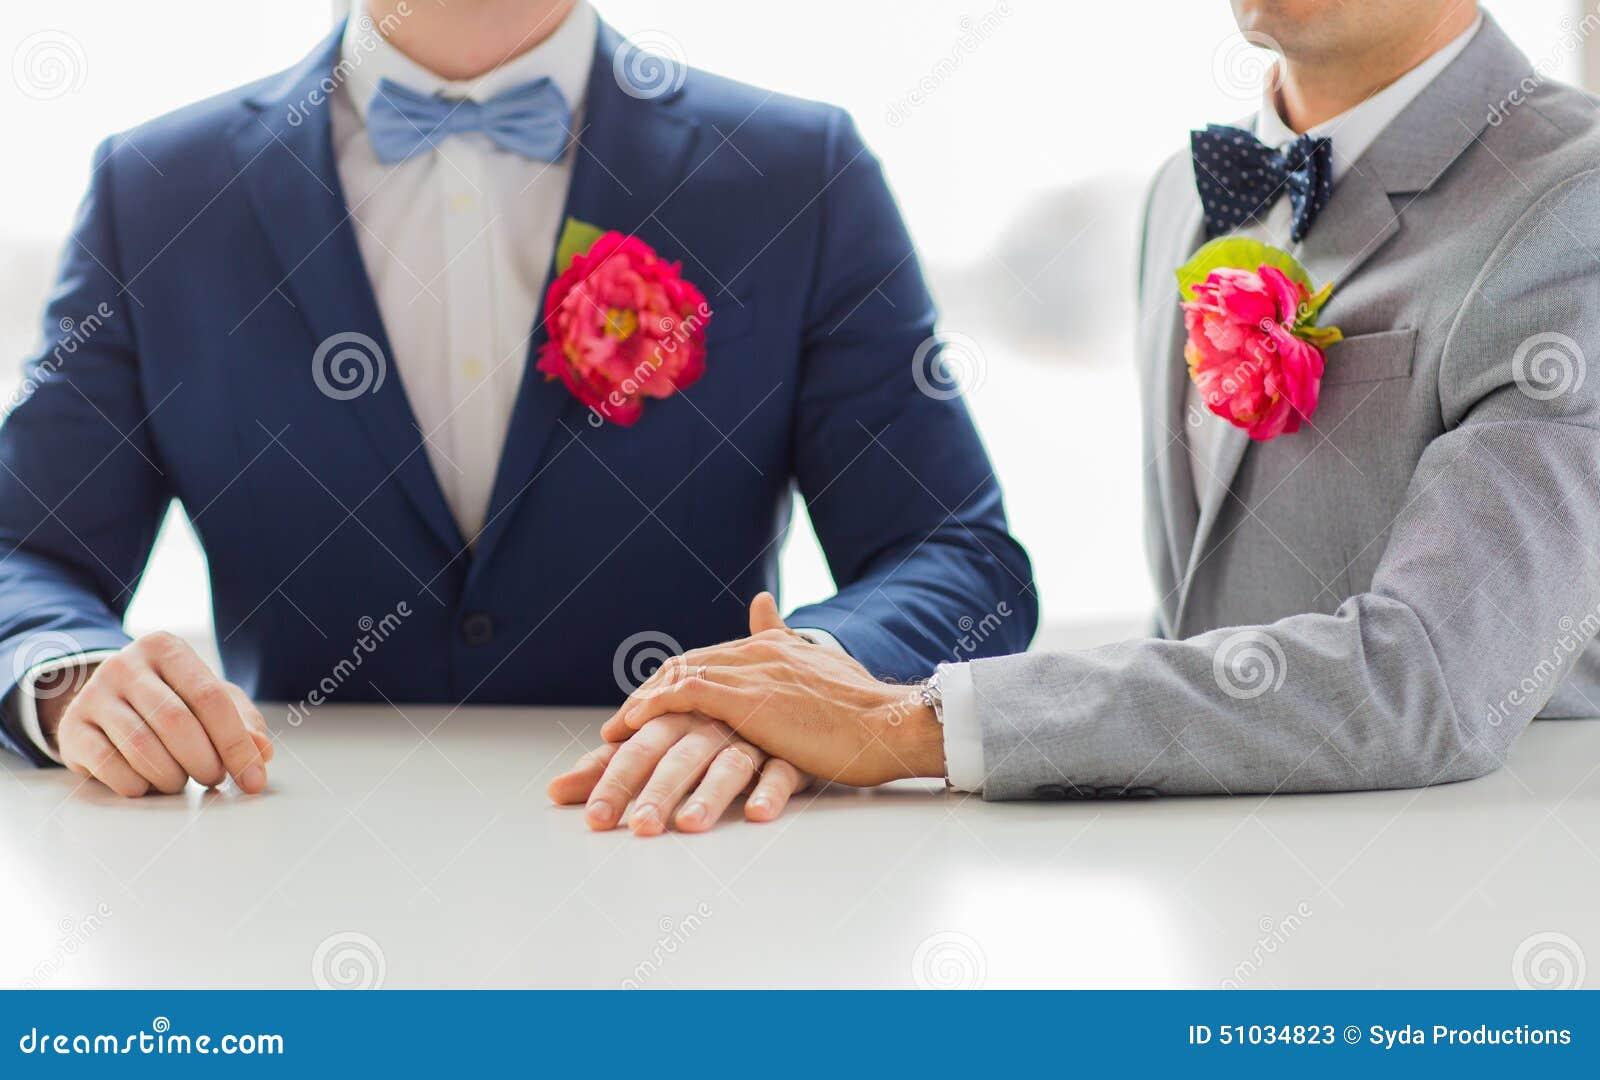 Supervisor has sex with subordinate